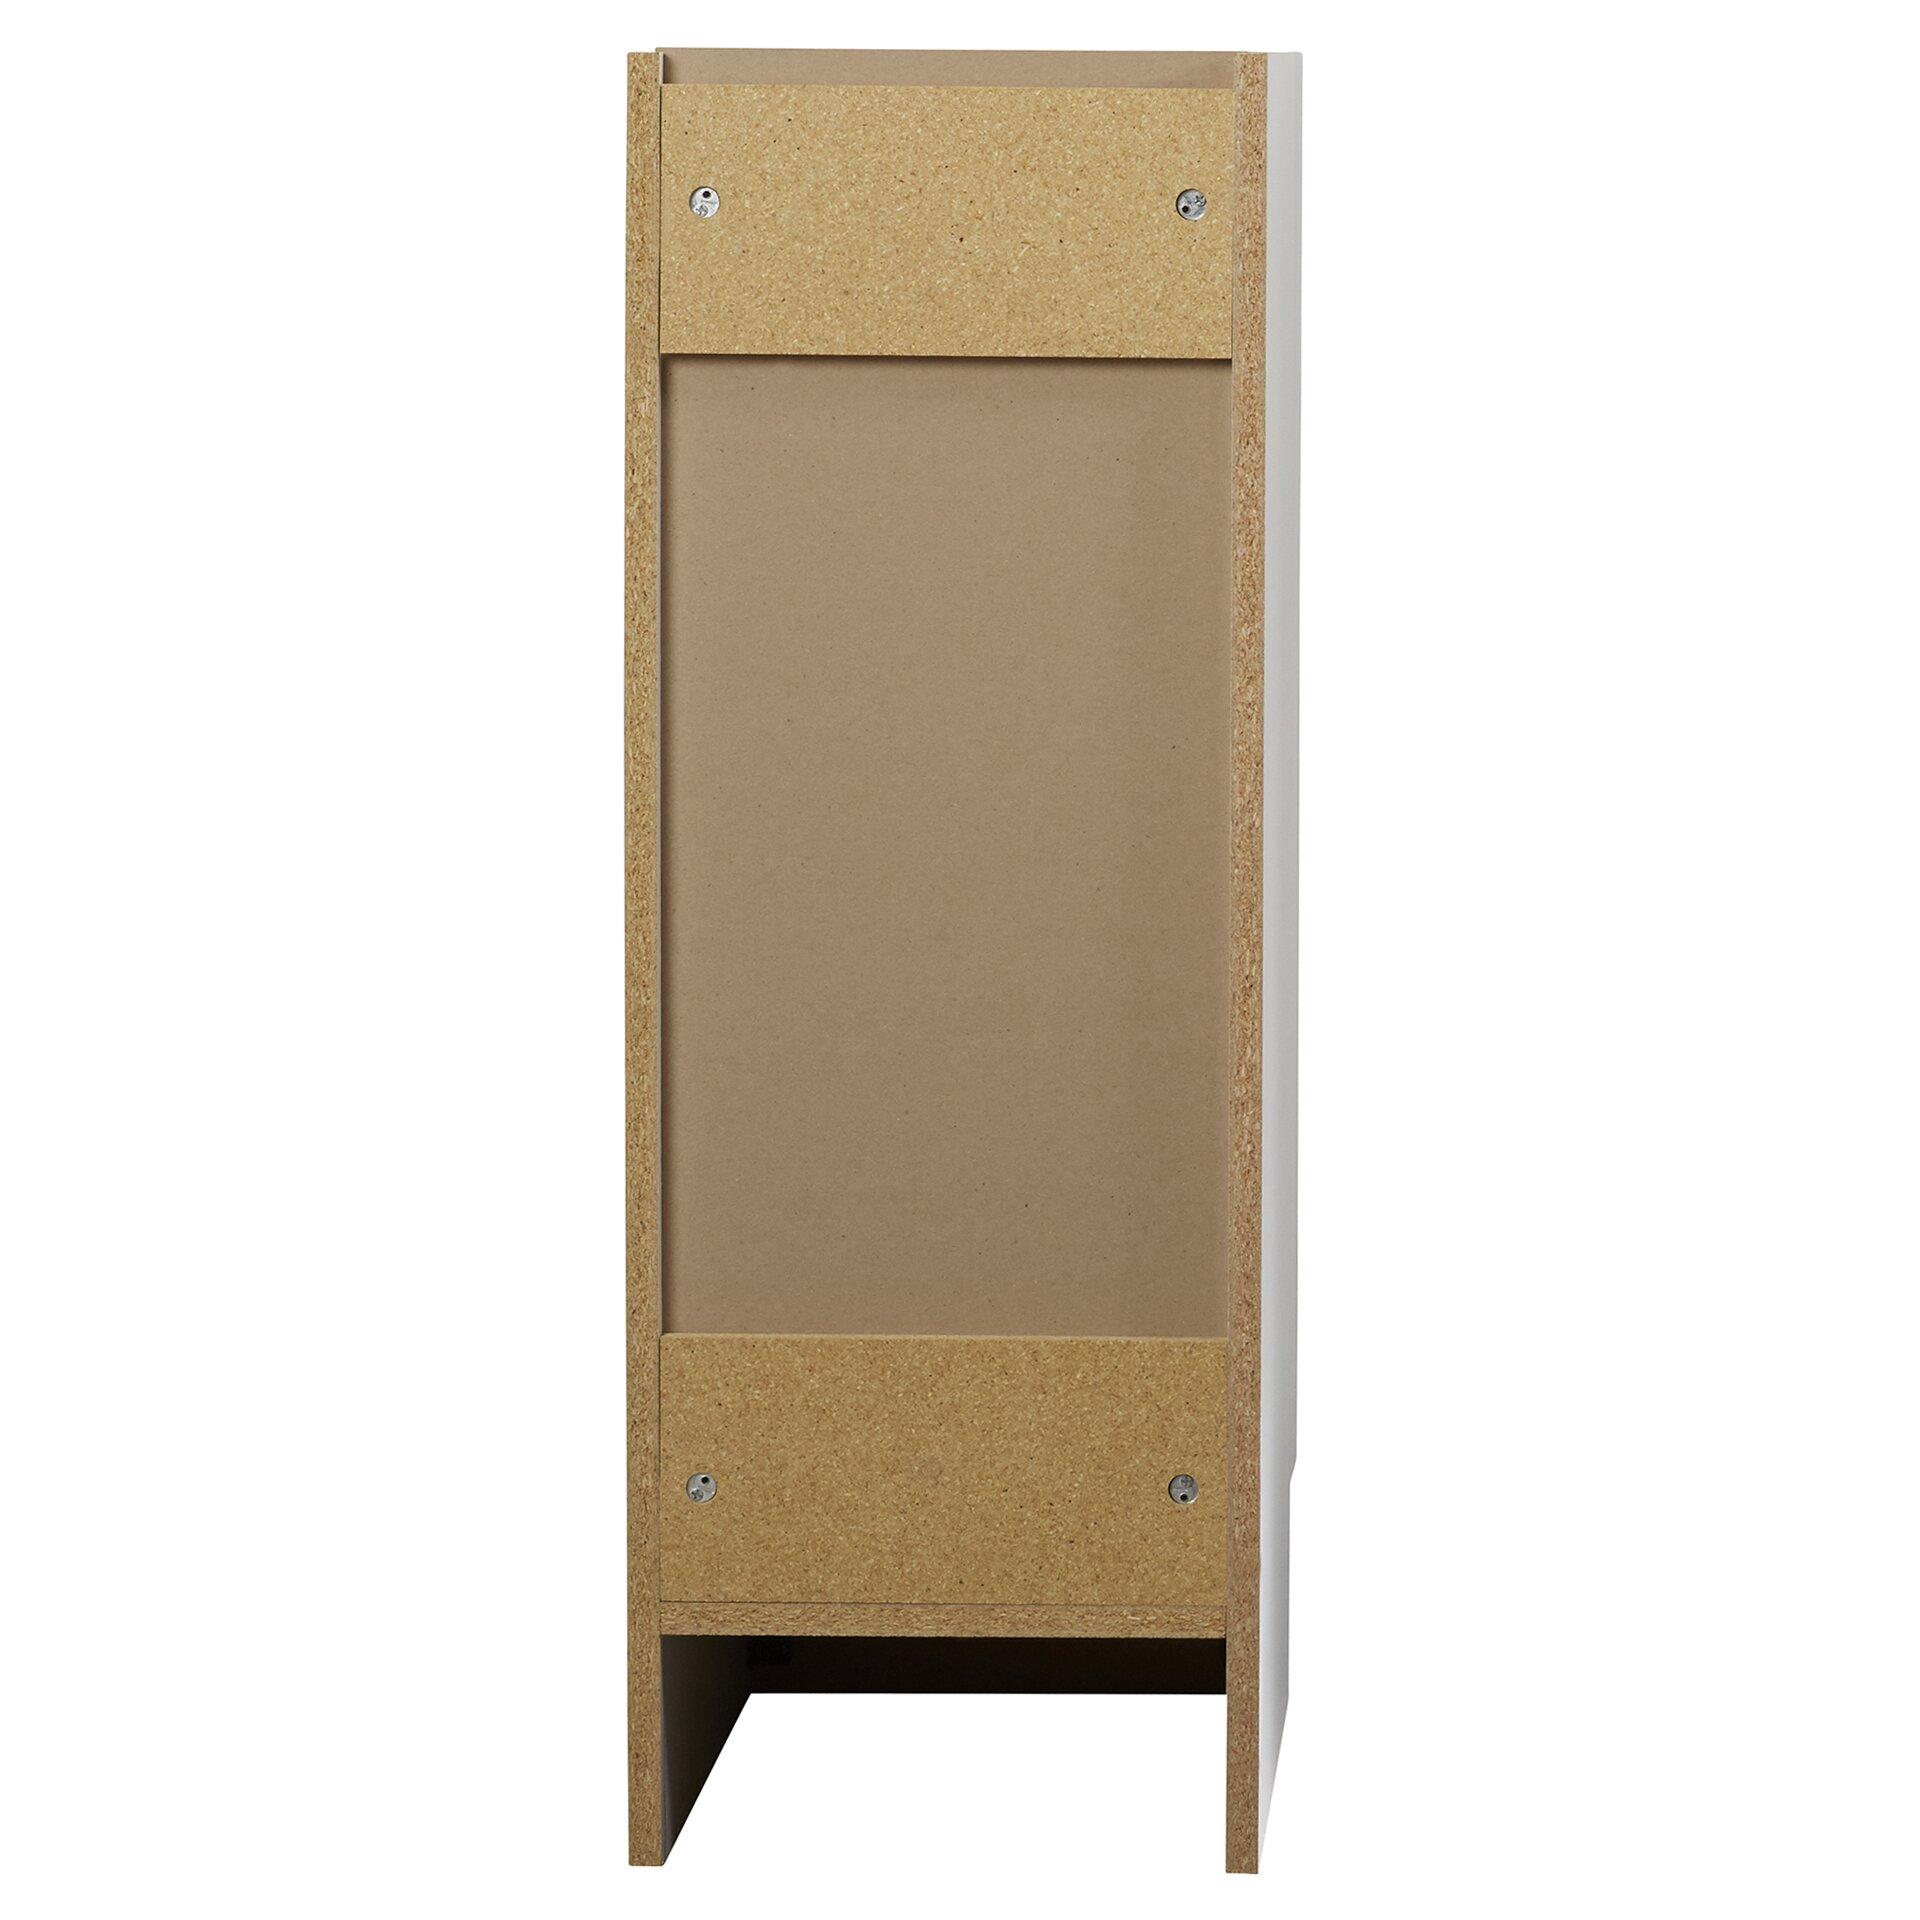 Keystone Cabinet Doors Mf Cabinets Oukasfo